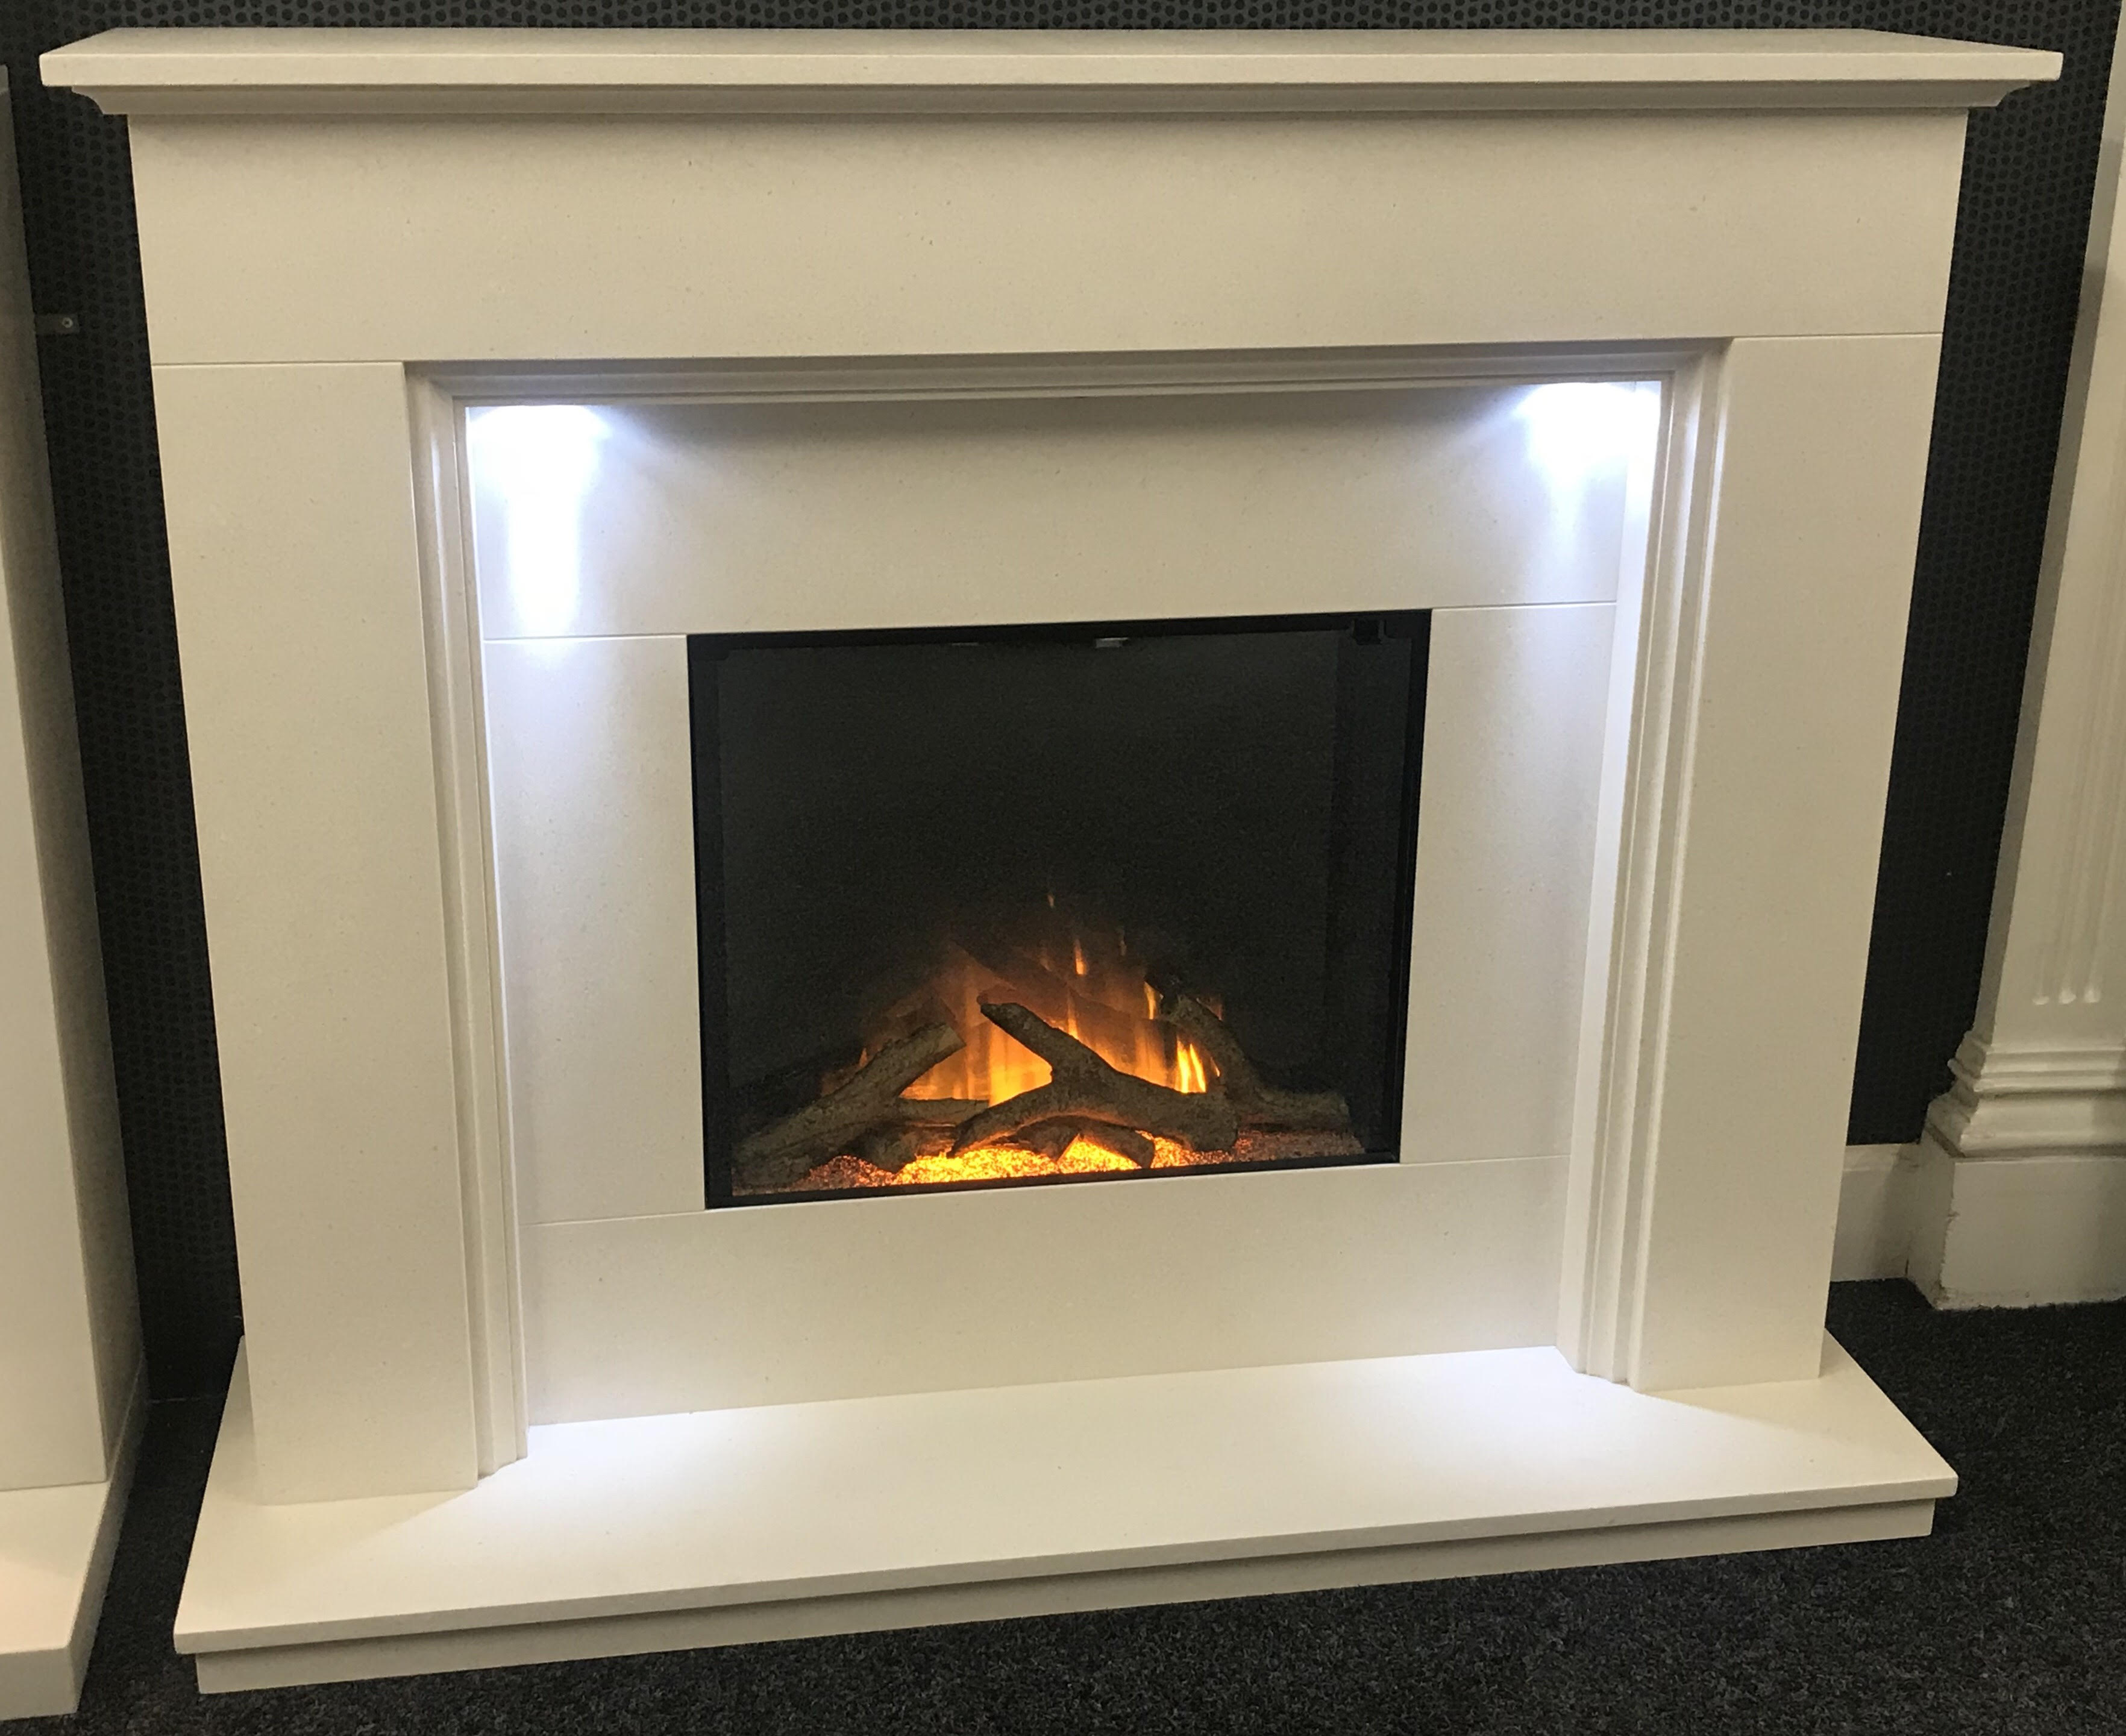 Glasgow Stoves Amp Fireplaces Wm Boyle Interior Finishes